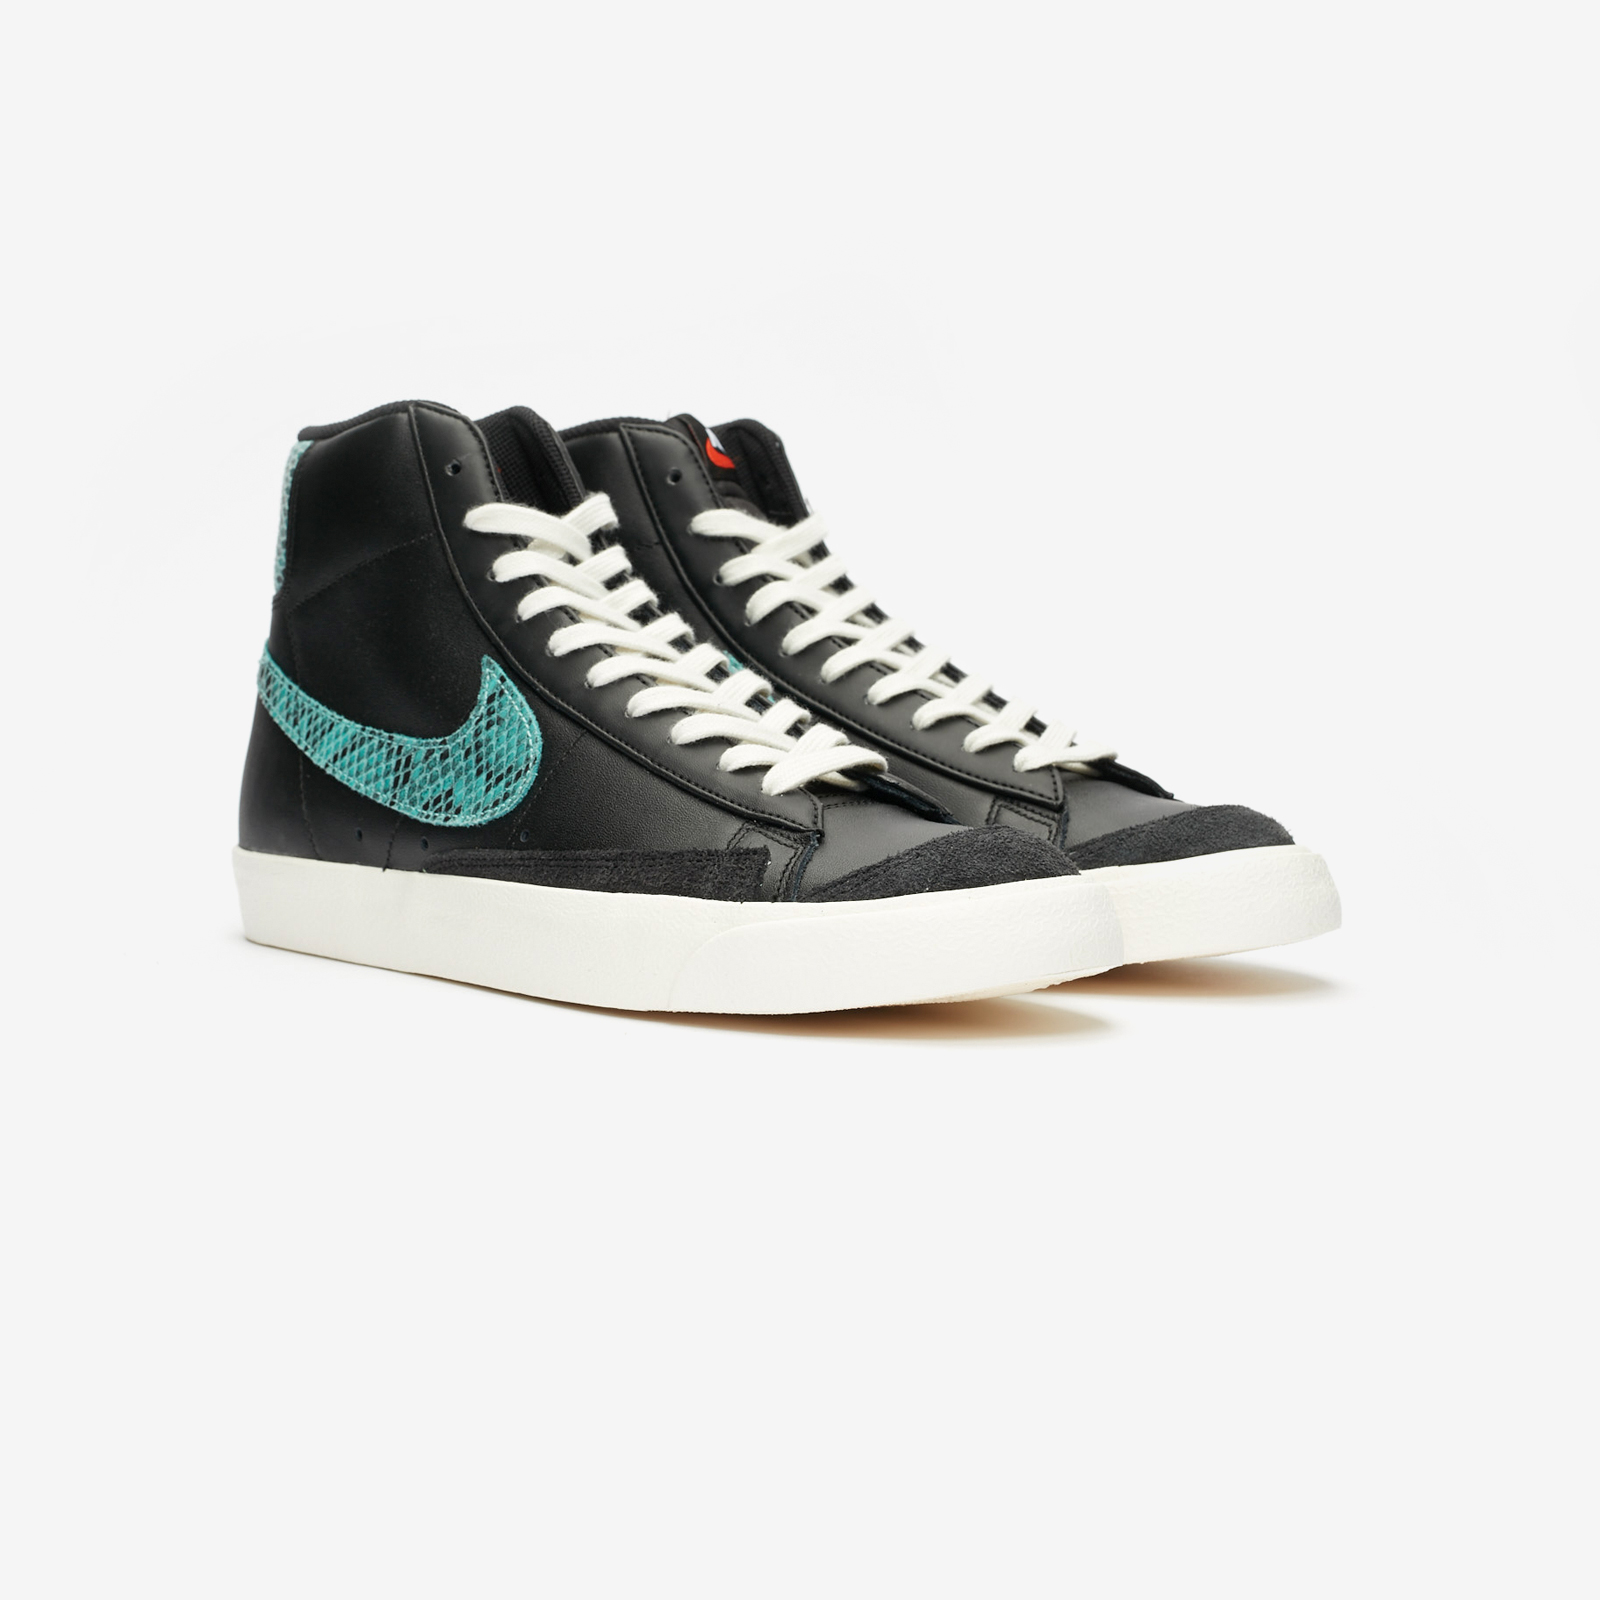 Nike Blazer Mid 77 VNTG Reptile - Ci1176-001 - SNS | sneakers ...